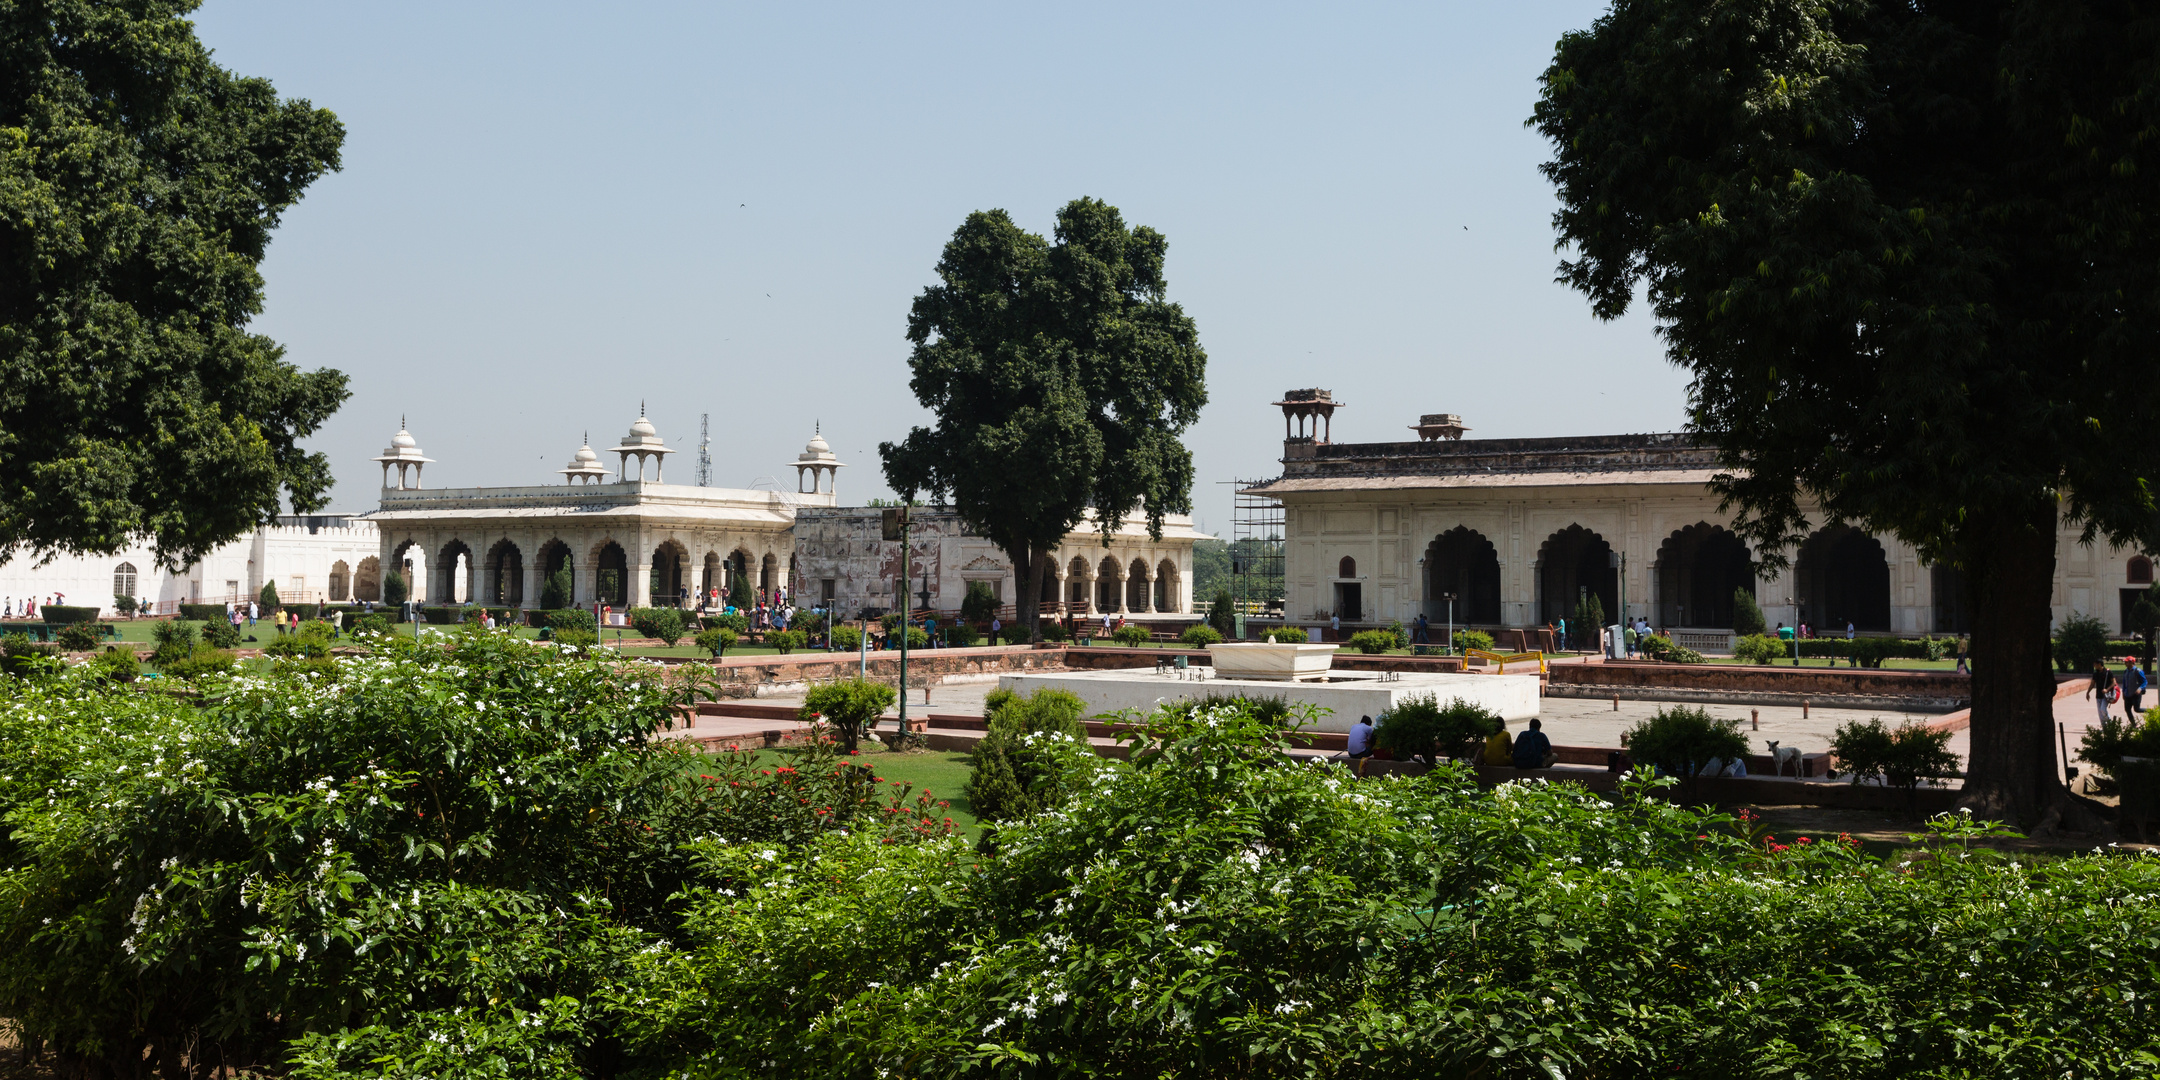 Harem, Palast des Shahs und private Audienzhalle...